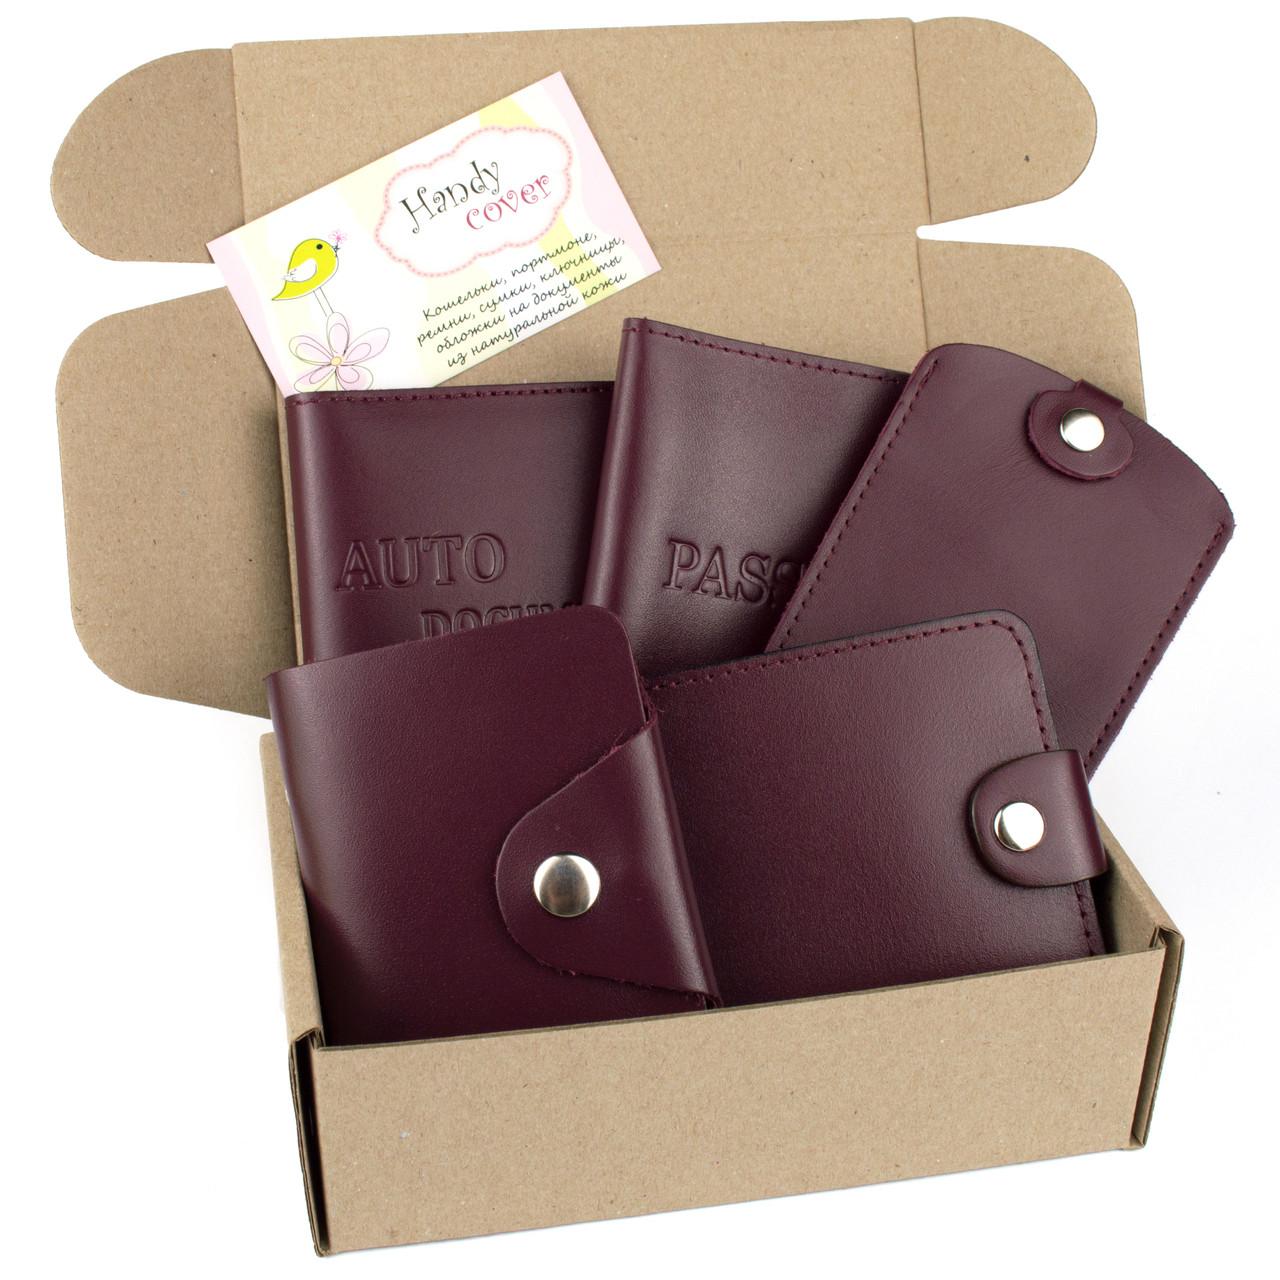 Подарочный набор №23: обложка на паспорт + на права + картхолдер + ключница + портмоне П3 (бордовый)